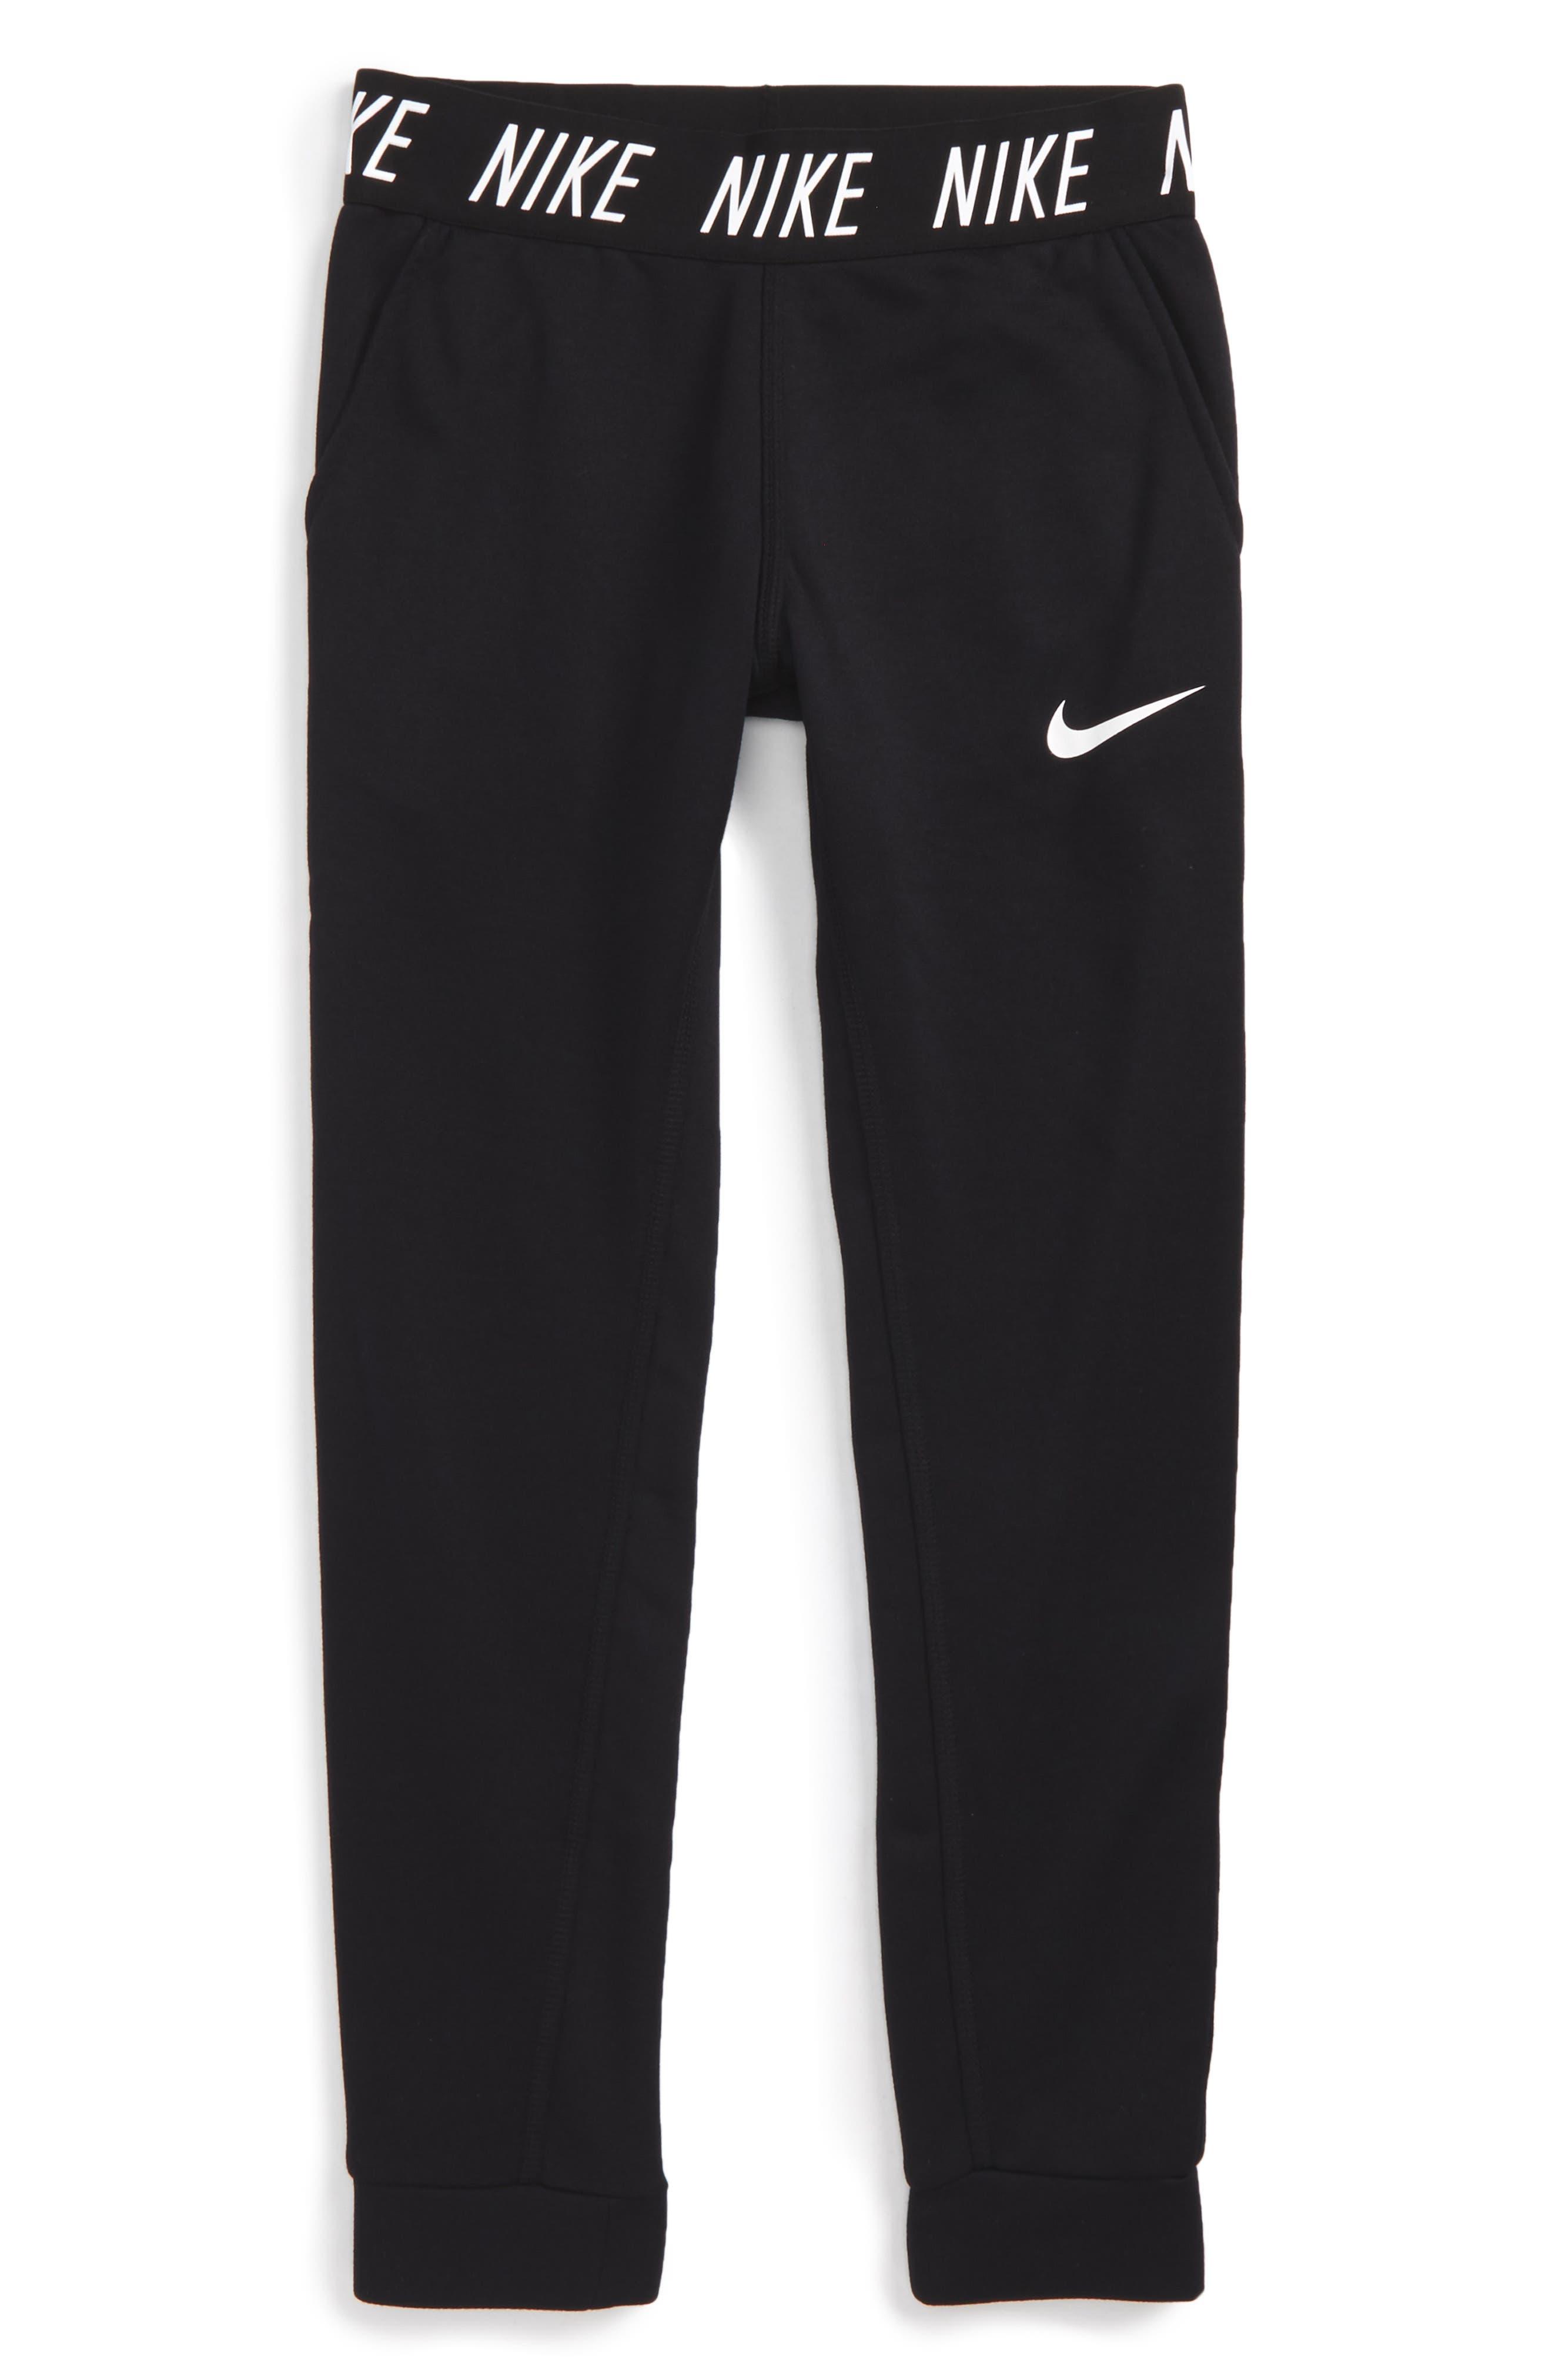 Alternate Image 1 Selected - Nike Dry Core Studio Training Pants (Big Girls)